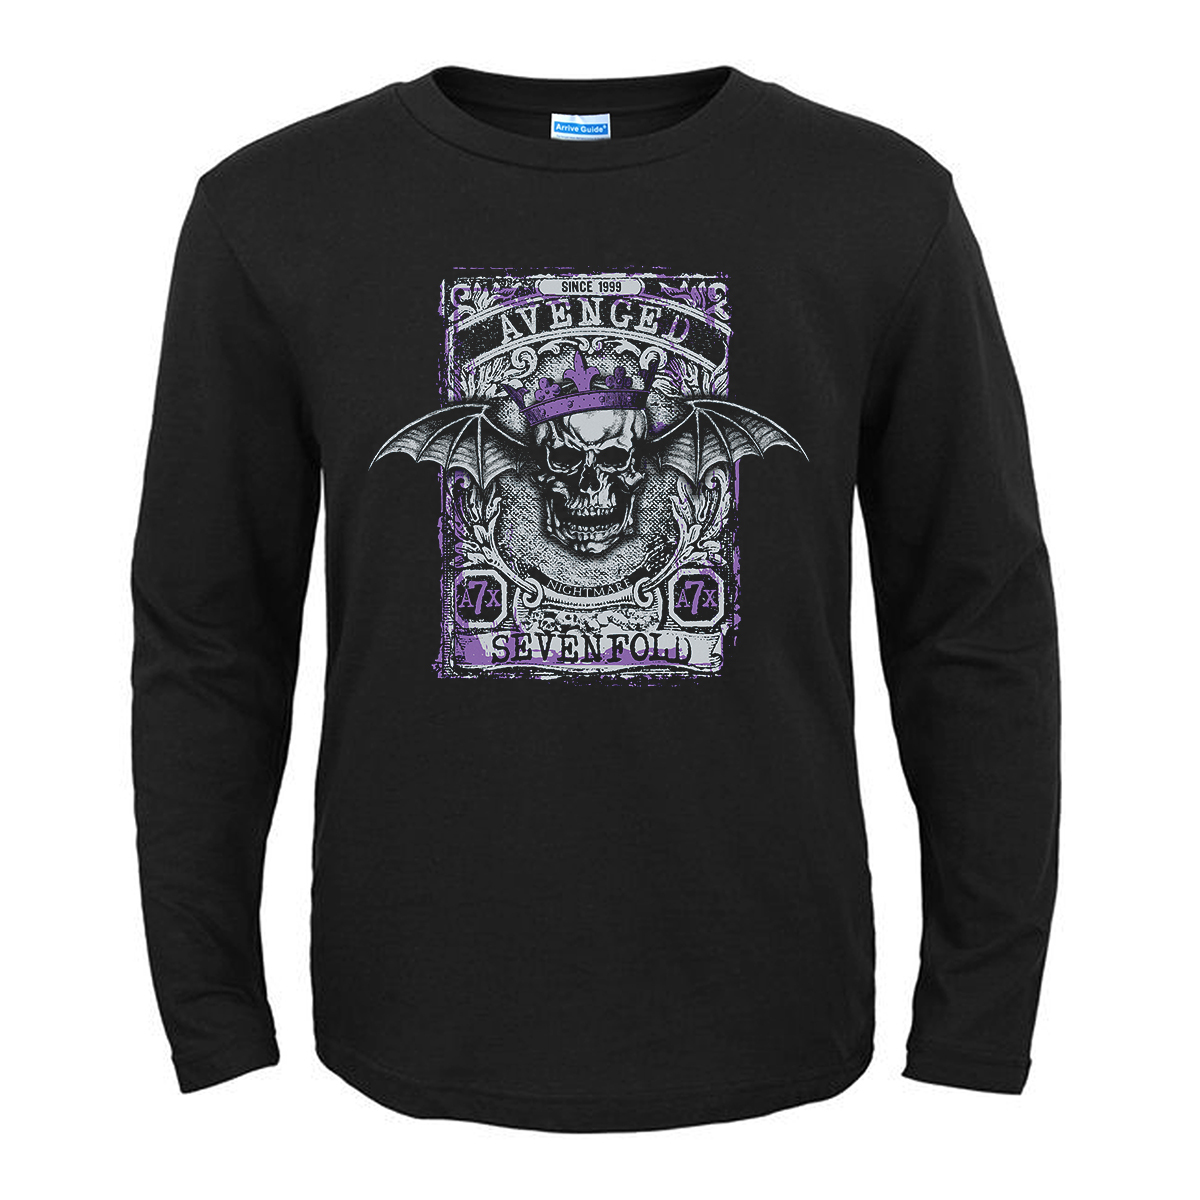 Merch T-Shirt Avenged Sevenfold Nightmare Black